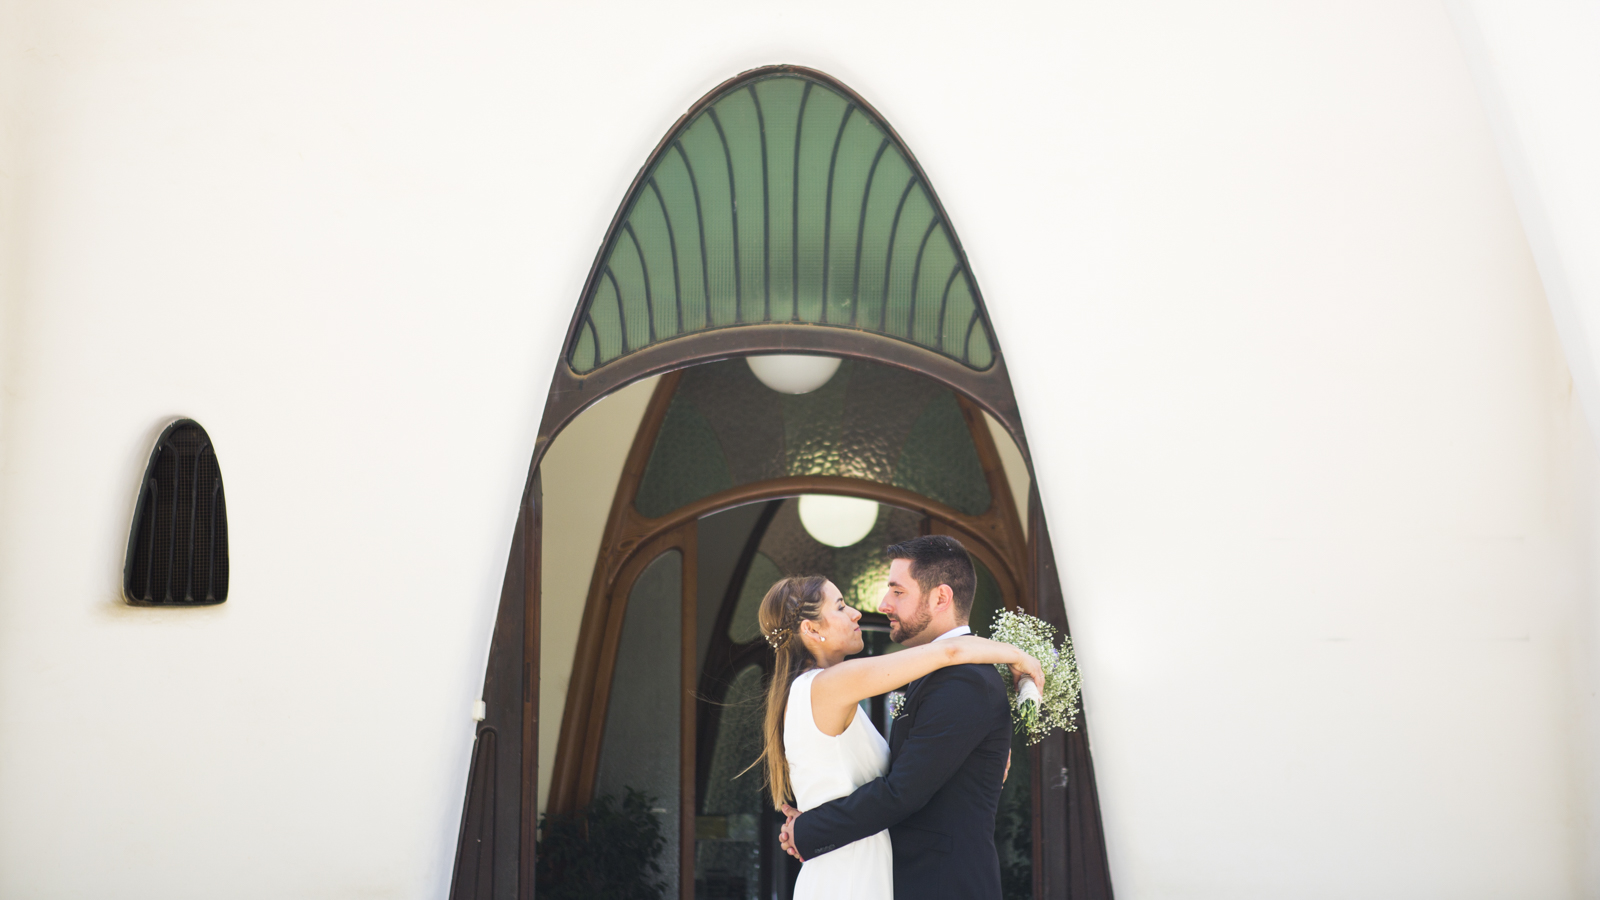 mia-moments-photo-boda-terrassa-mas-bonvilar-fotografia-144.jpg